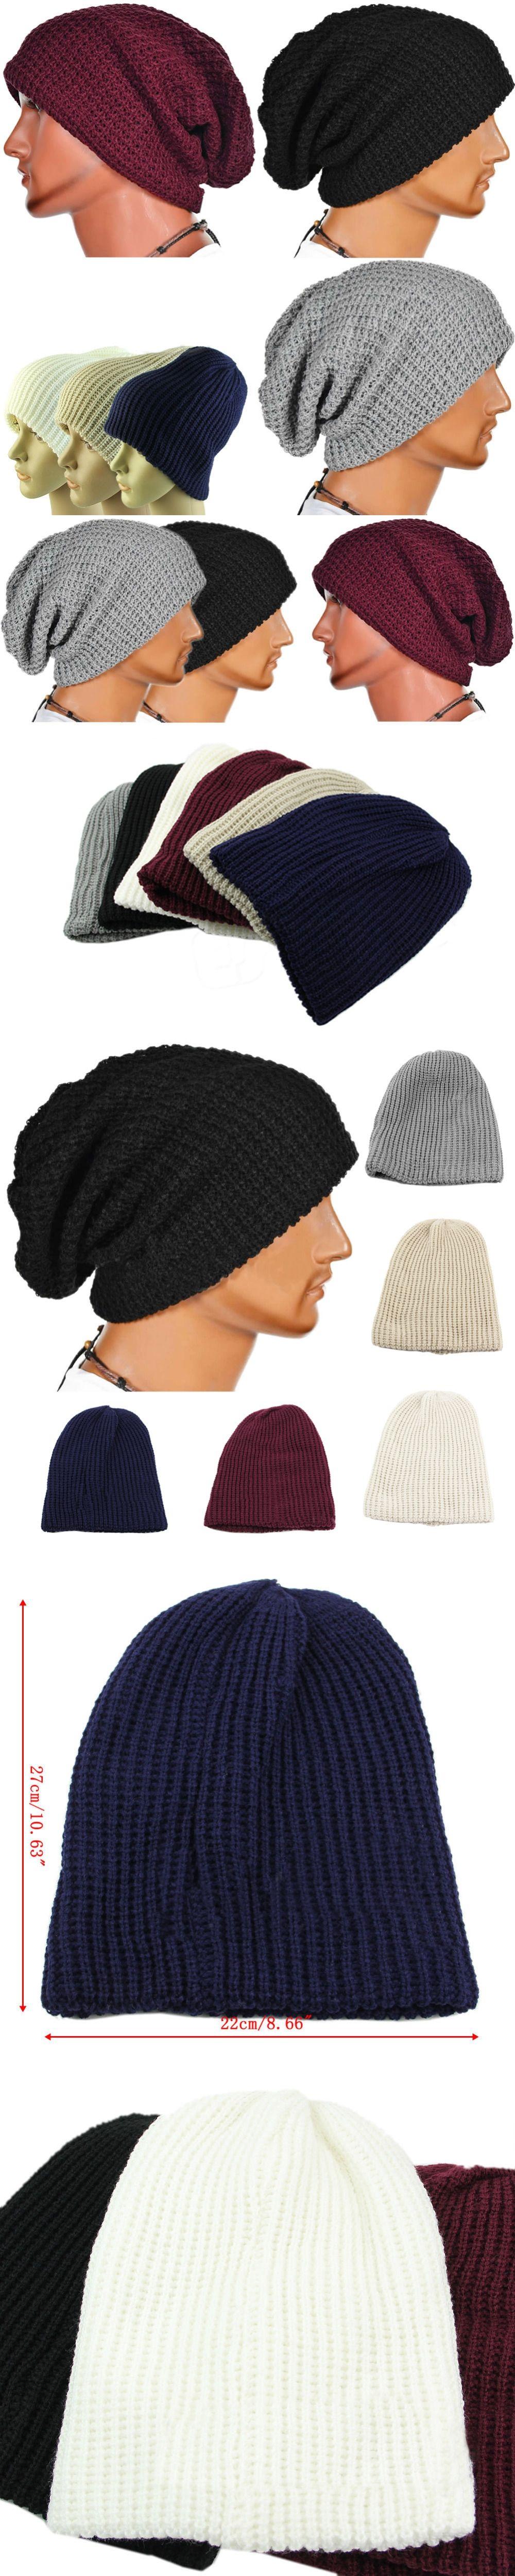 Hot Selling 2017 Chic Men Women Warm Winter Knitted Beanies Skull Bandana  Slouchy Oversized Cap Hip 089d33d29b51